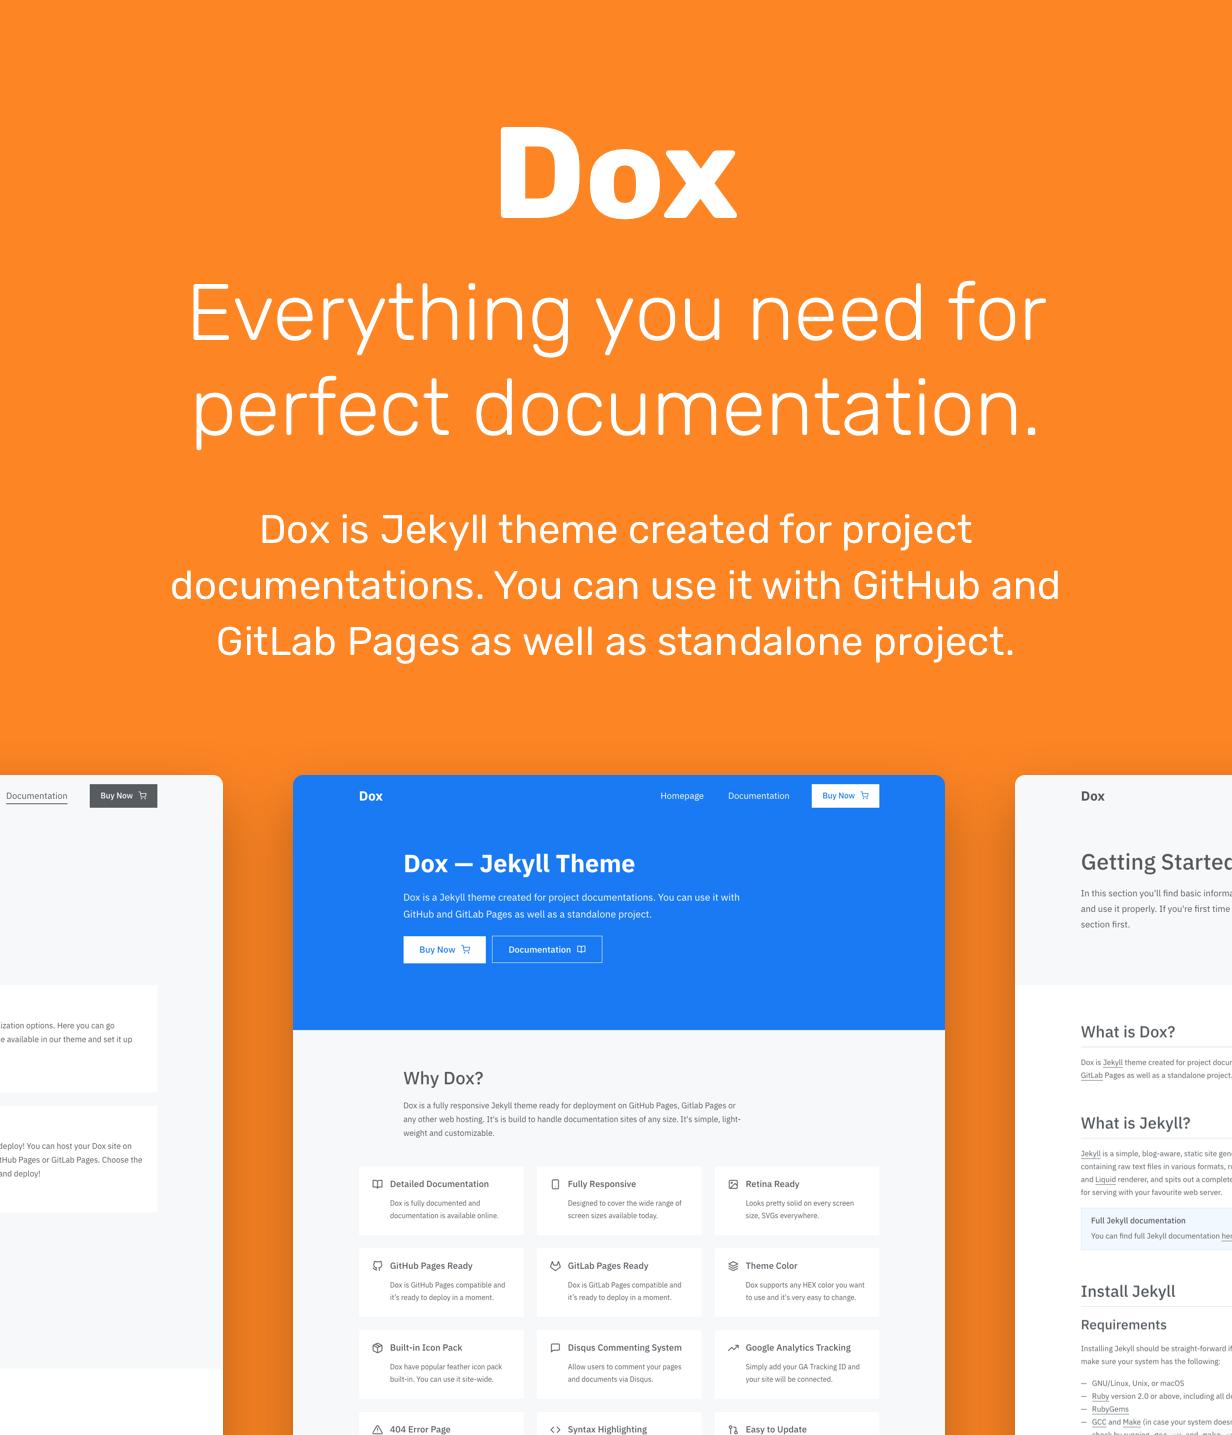 Dox — Jekyll Theme for Project Documentation